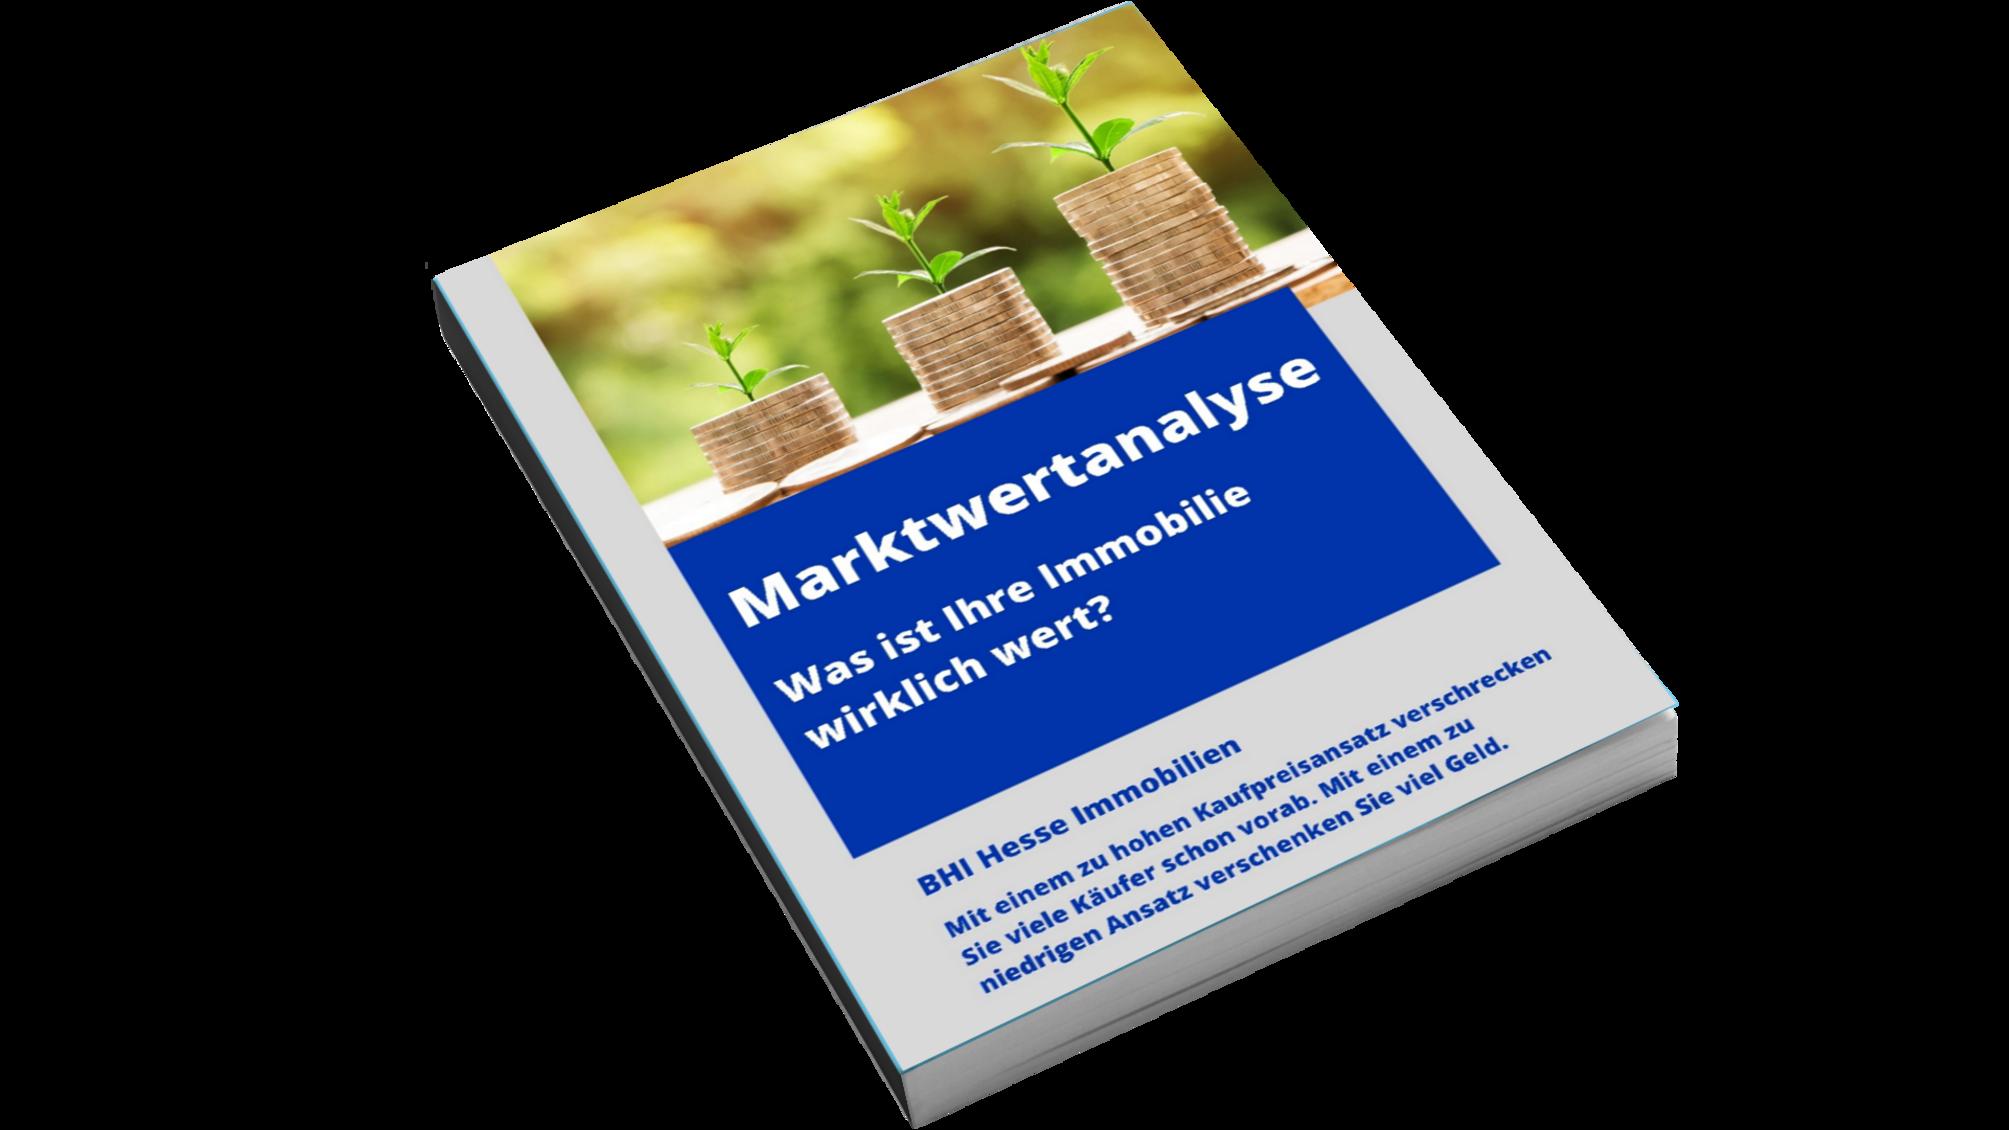 Marktwertanalyse Immobilienmakler Spandau